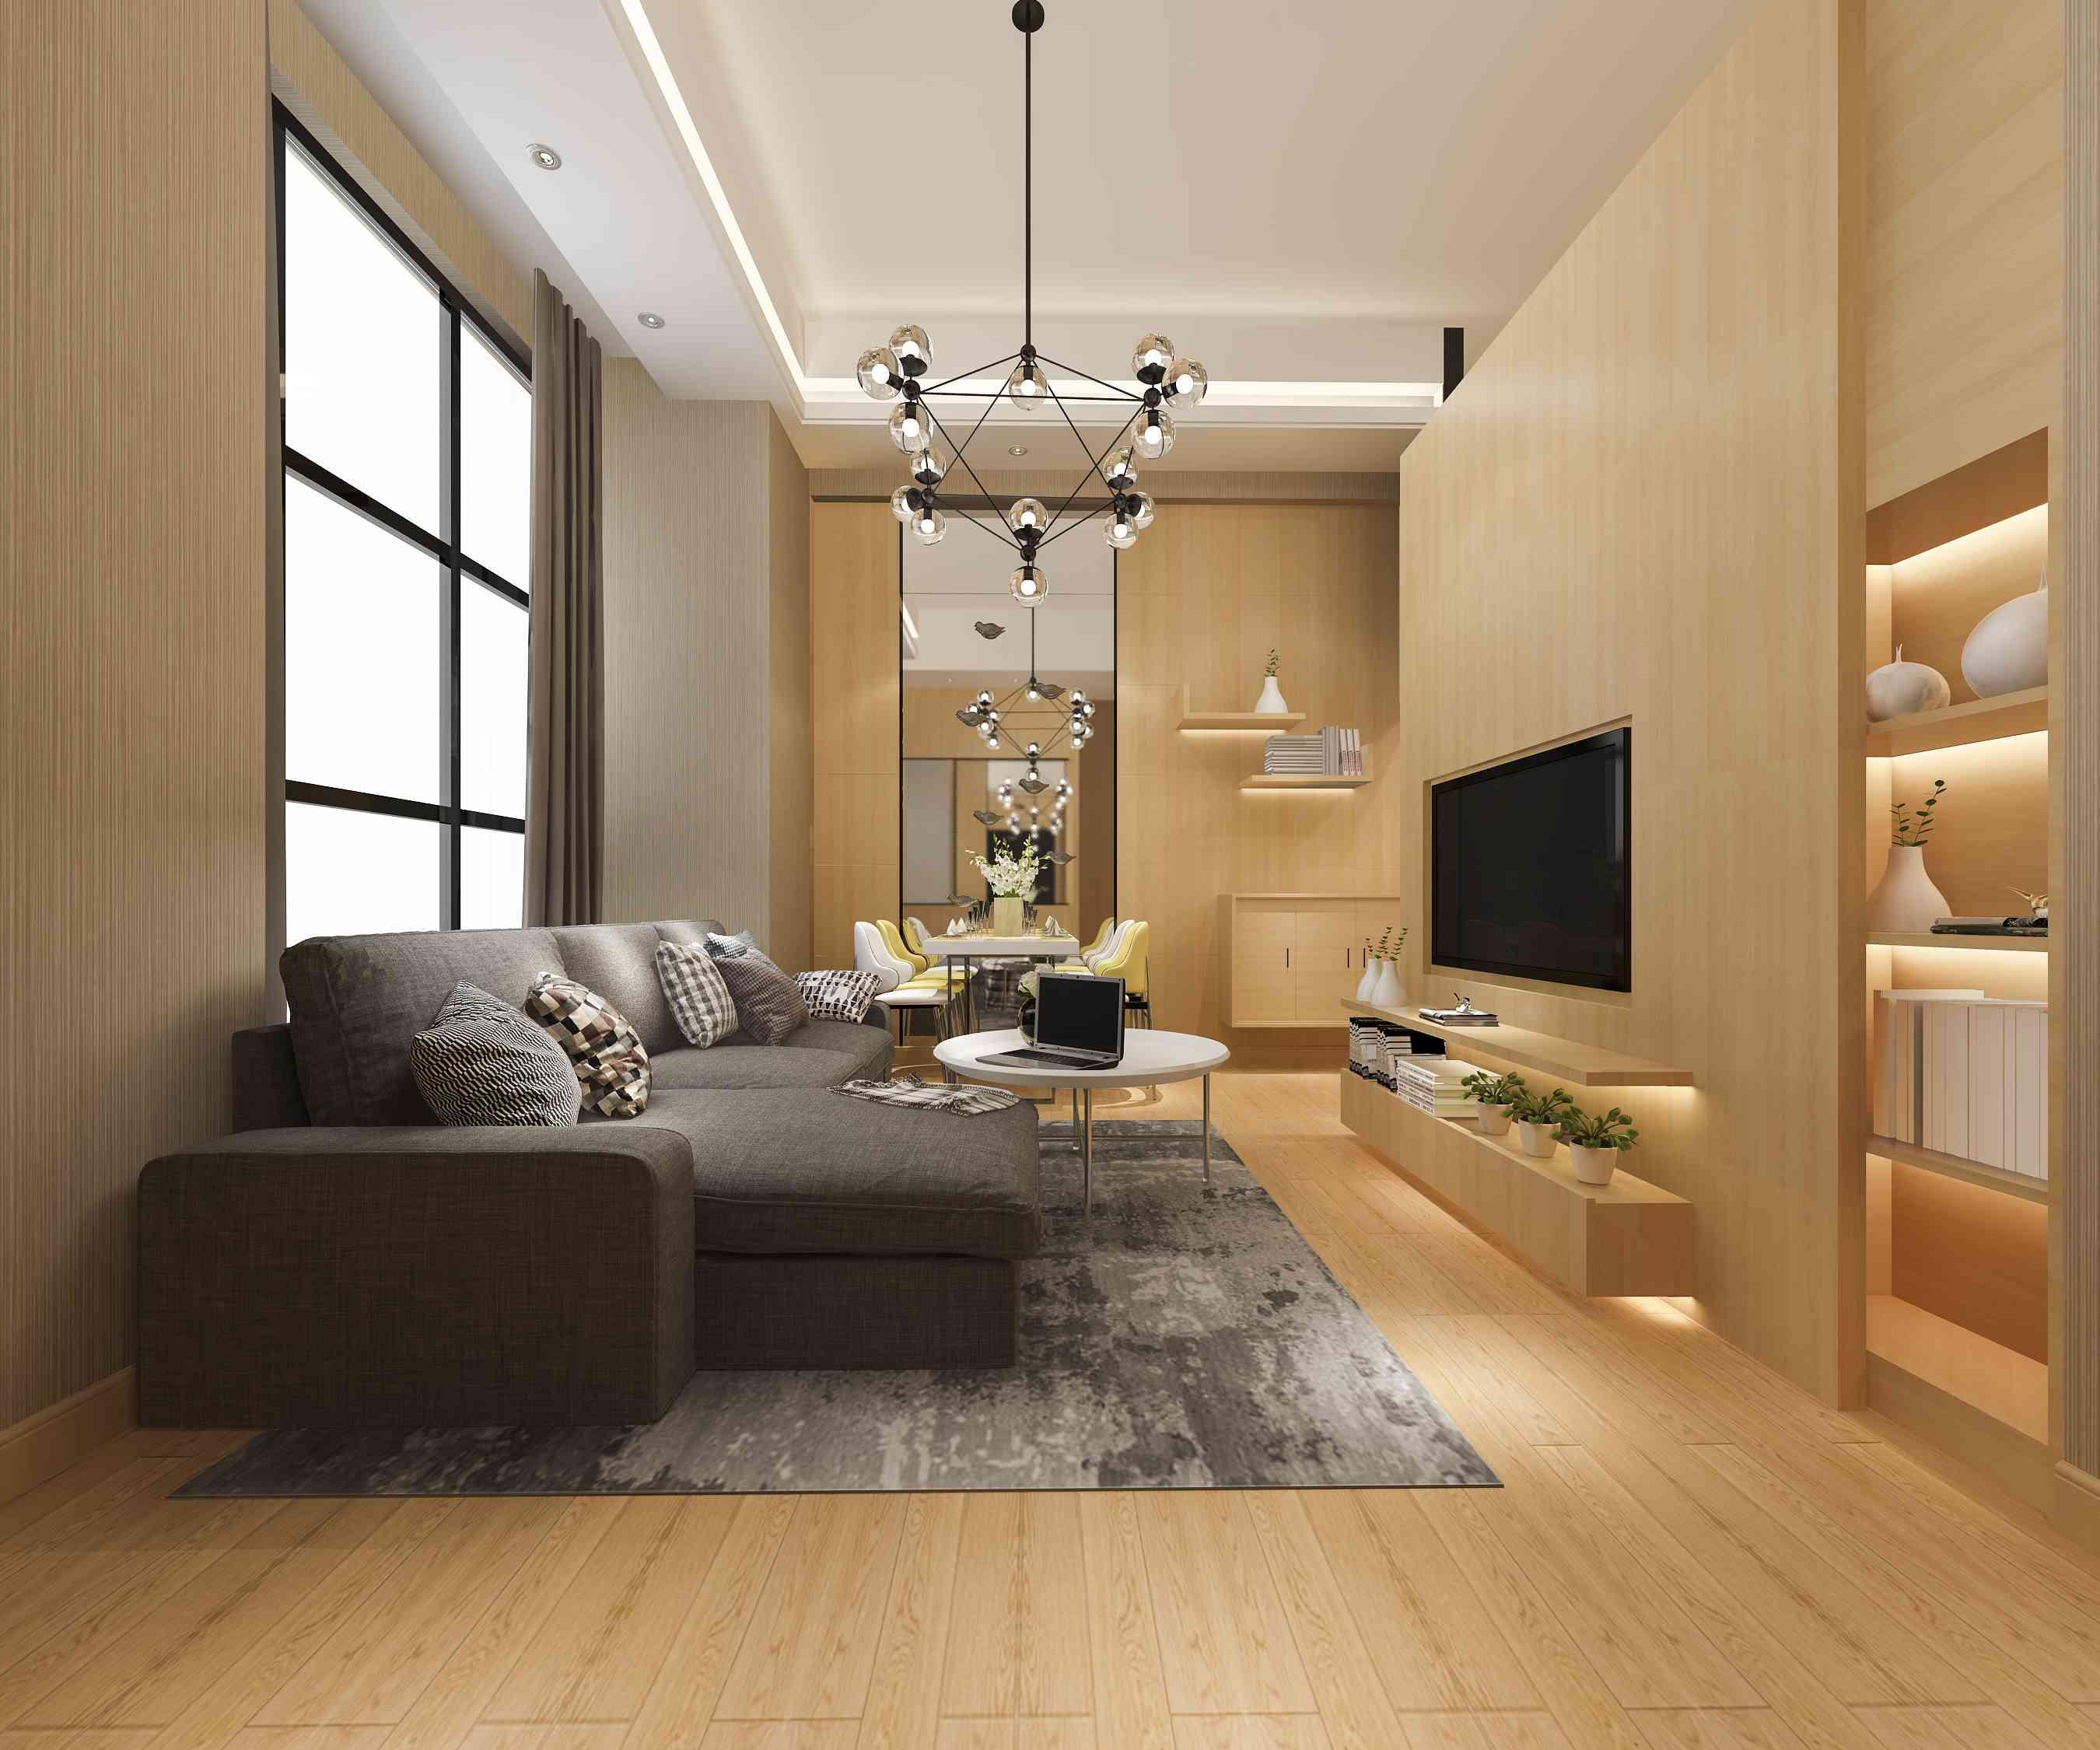 Living Room Lighting Ideas, Lighting Design Living Room